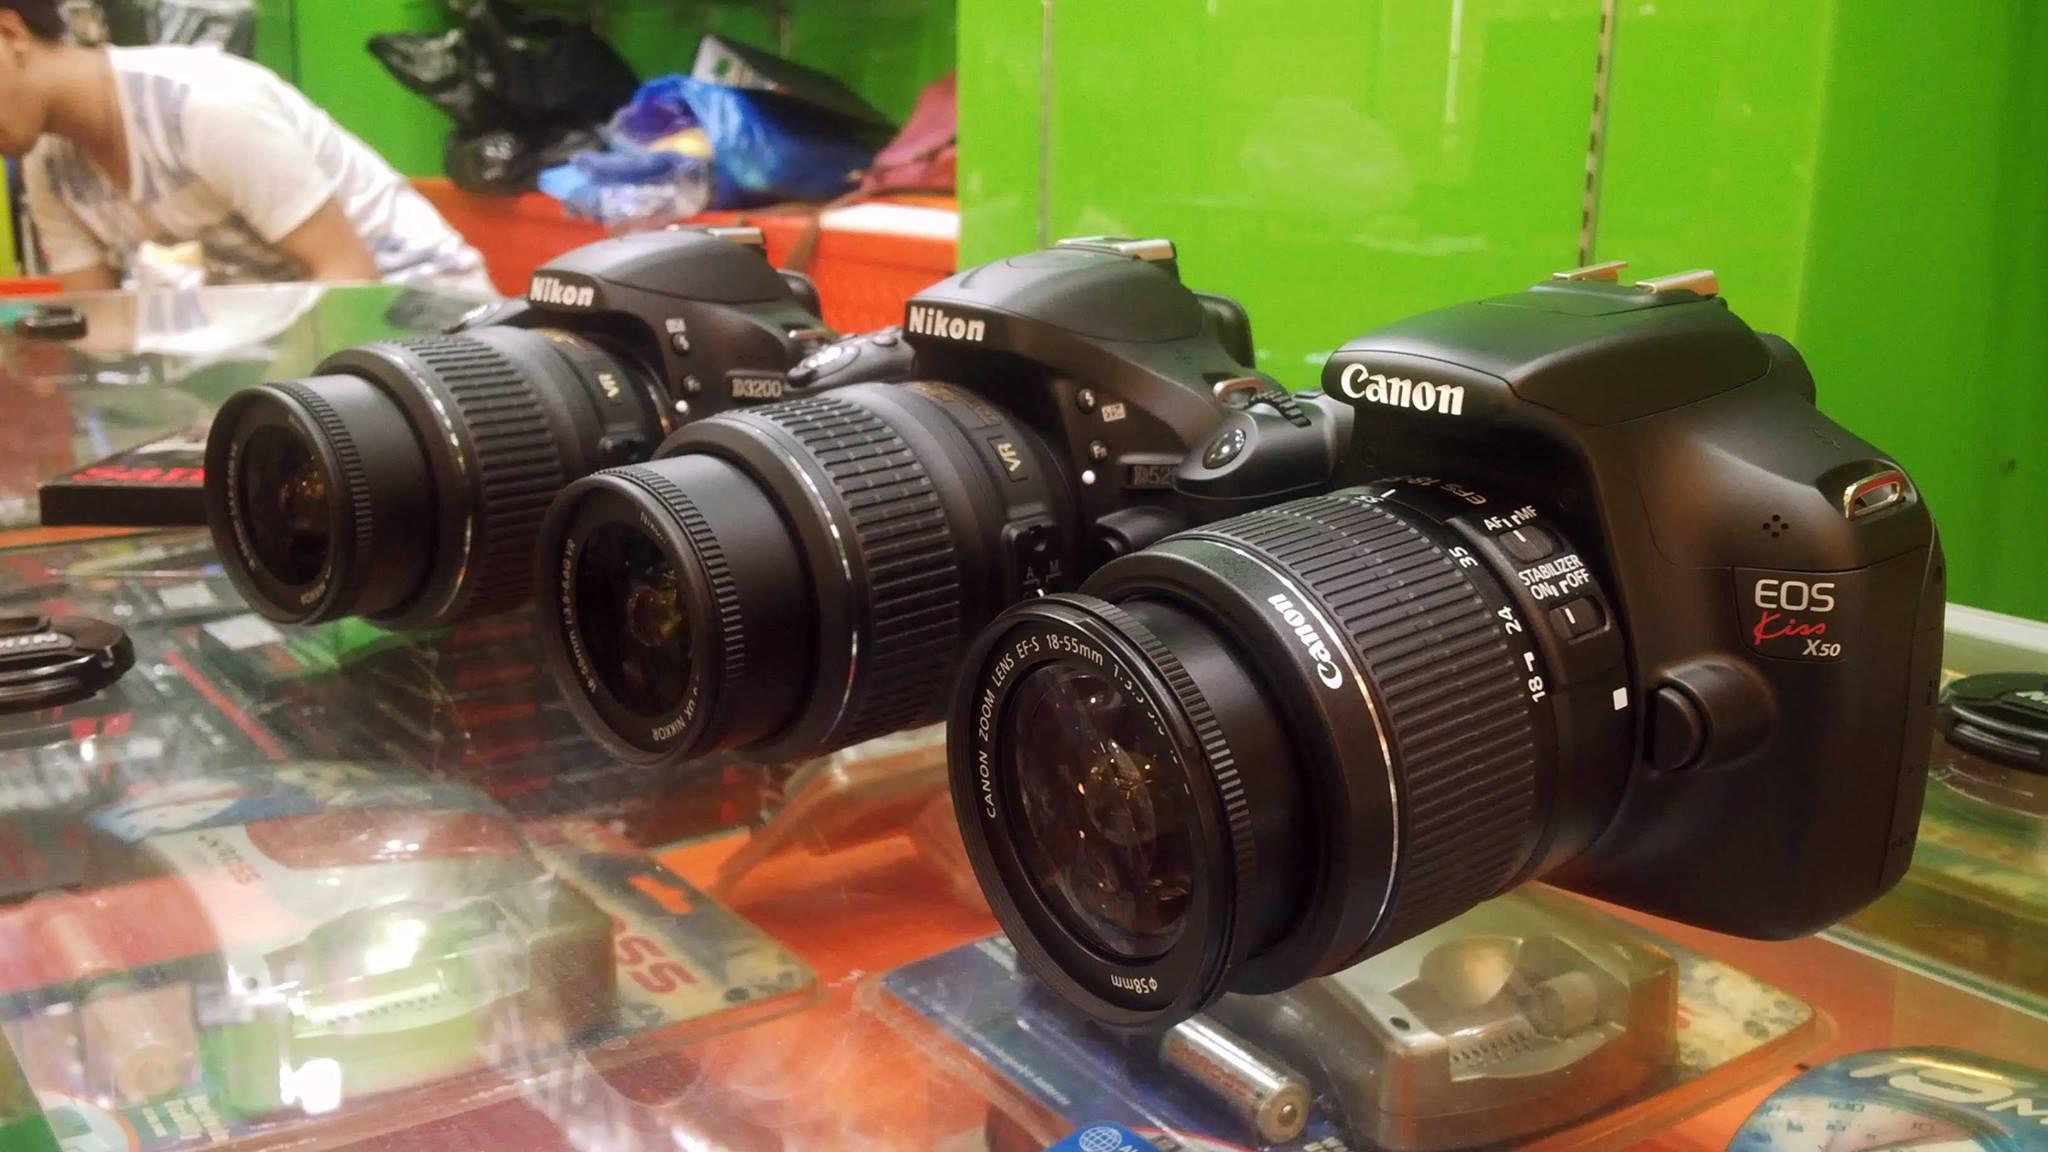 Nyobain Kamera Canon Kiss X50 Dan D700 Emanuel Setio Dewo